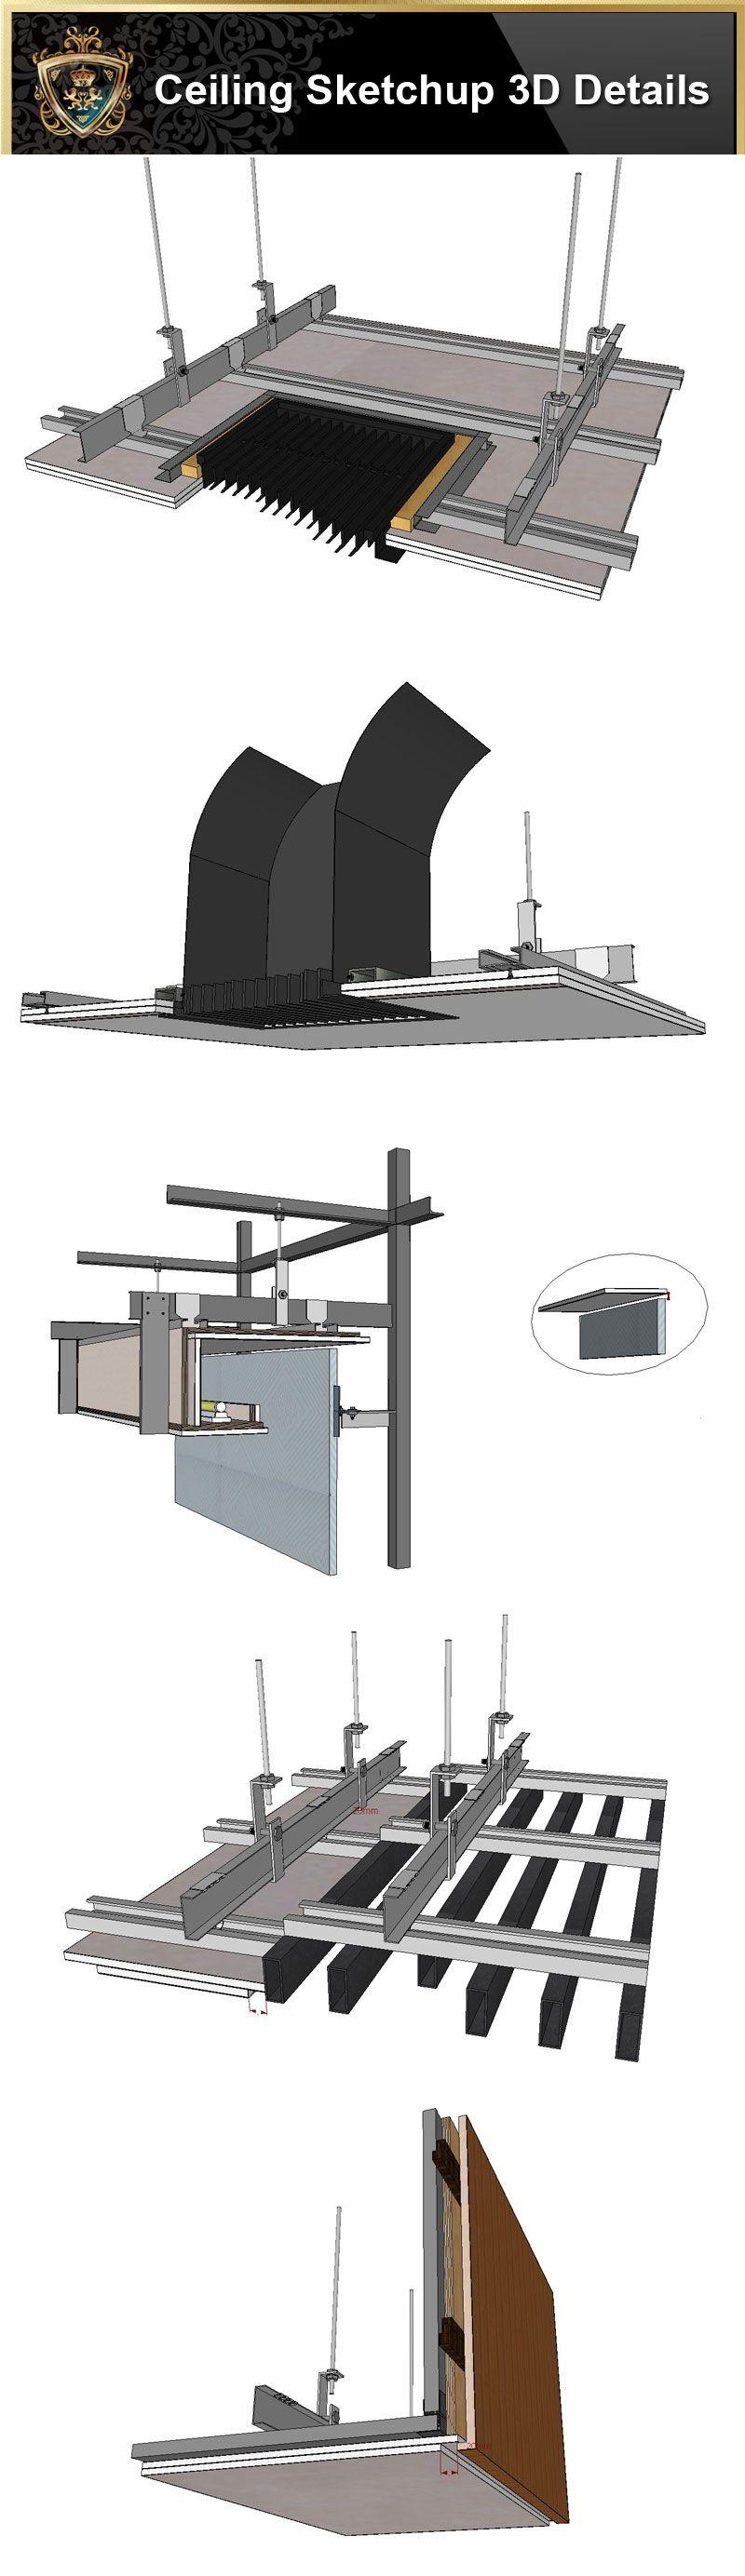 【Best 70 Types Ceiling Sketchup 3D Detail Models】Sketch